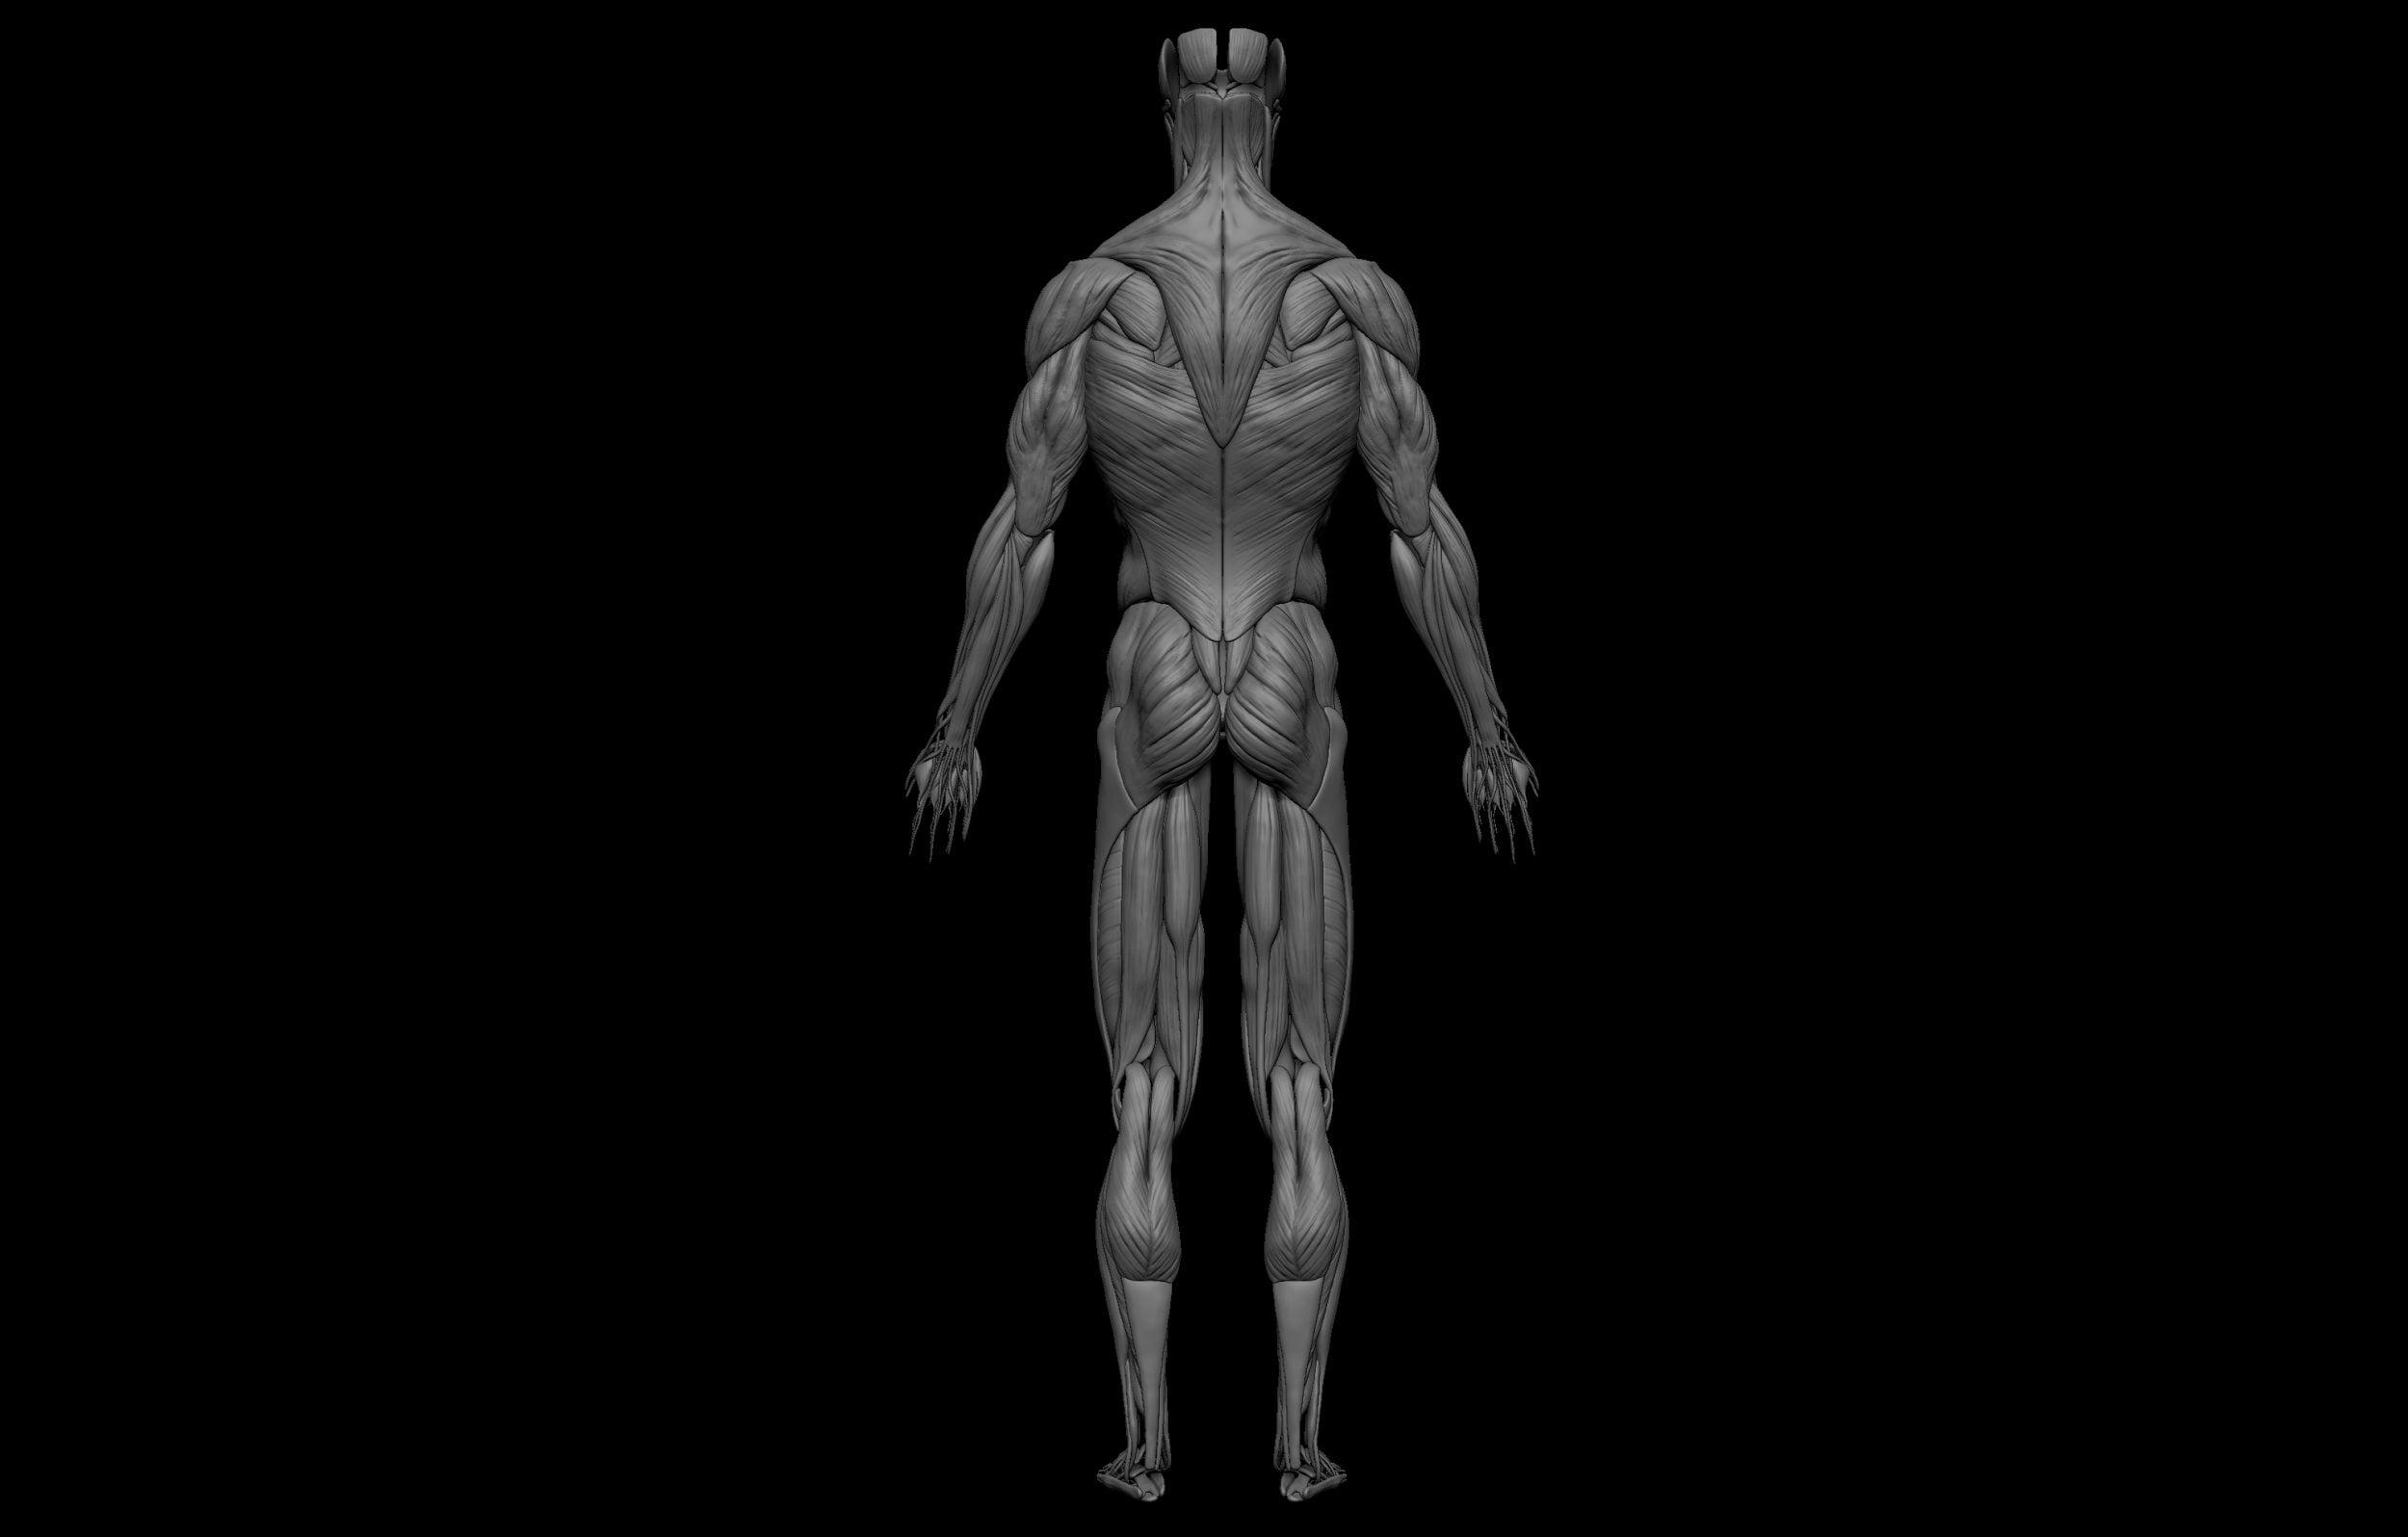 12 3 scaled SA Anatomy   Study Anatomy in 3D